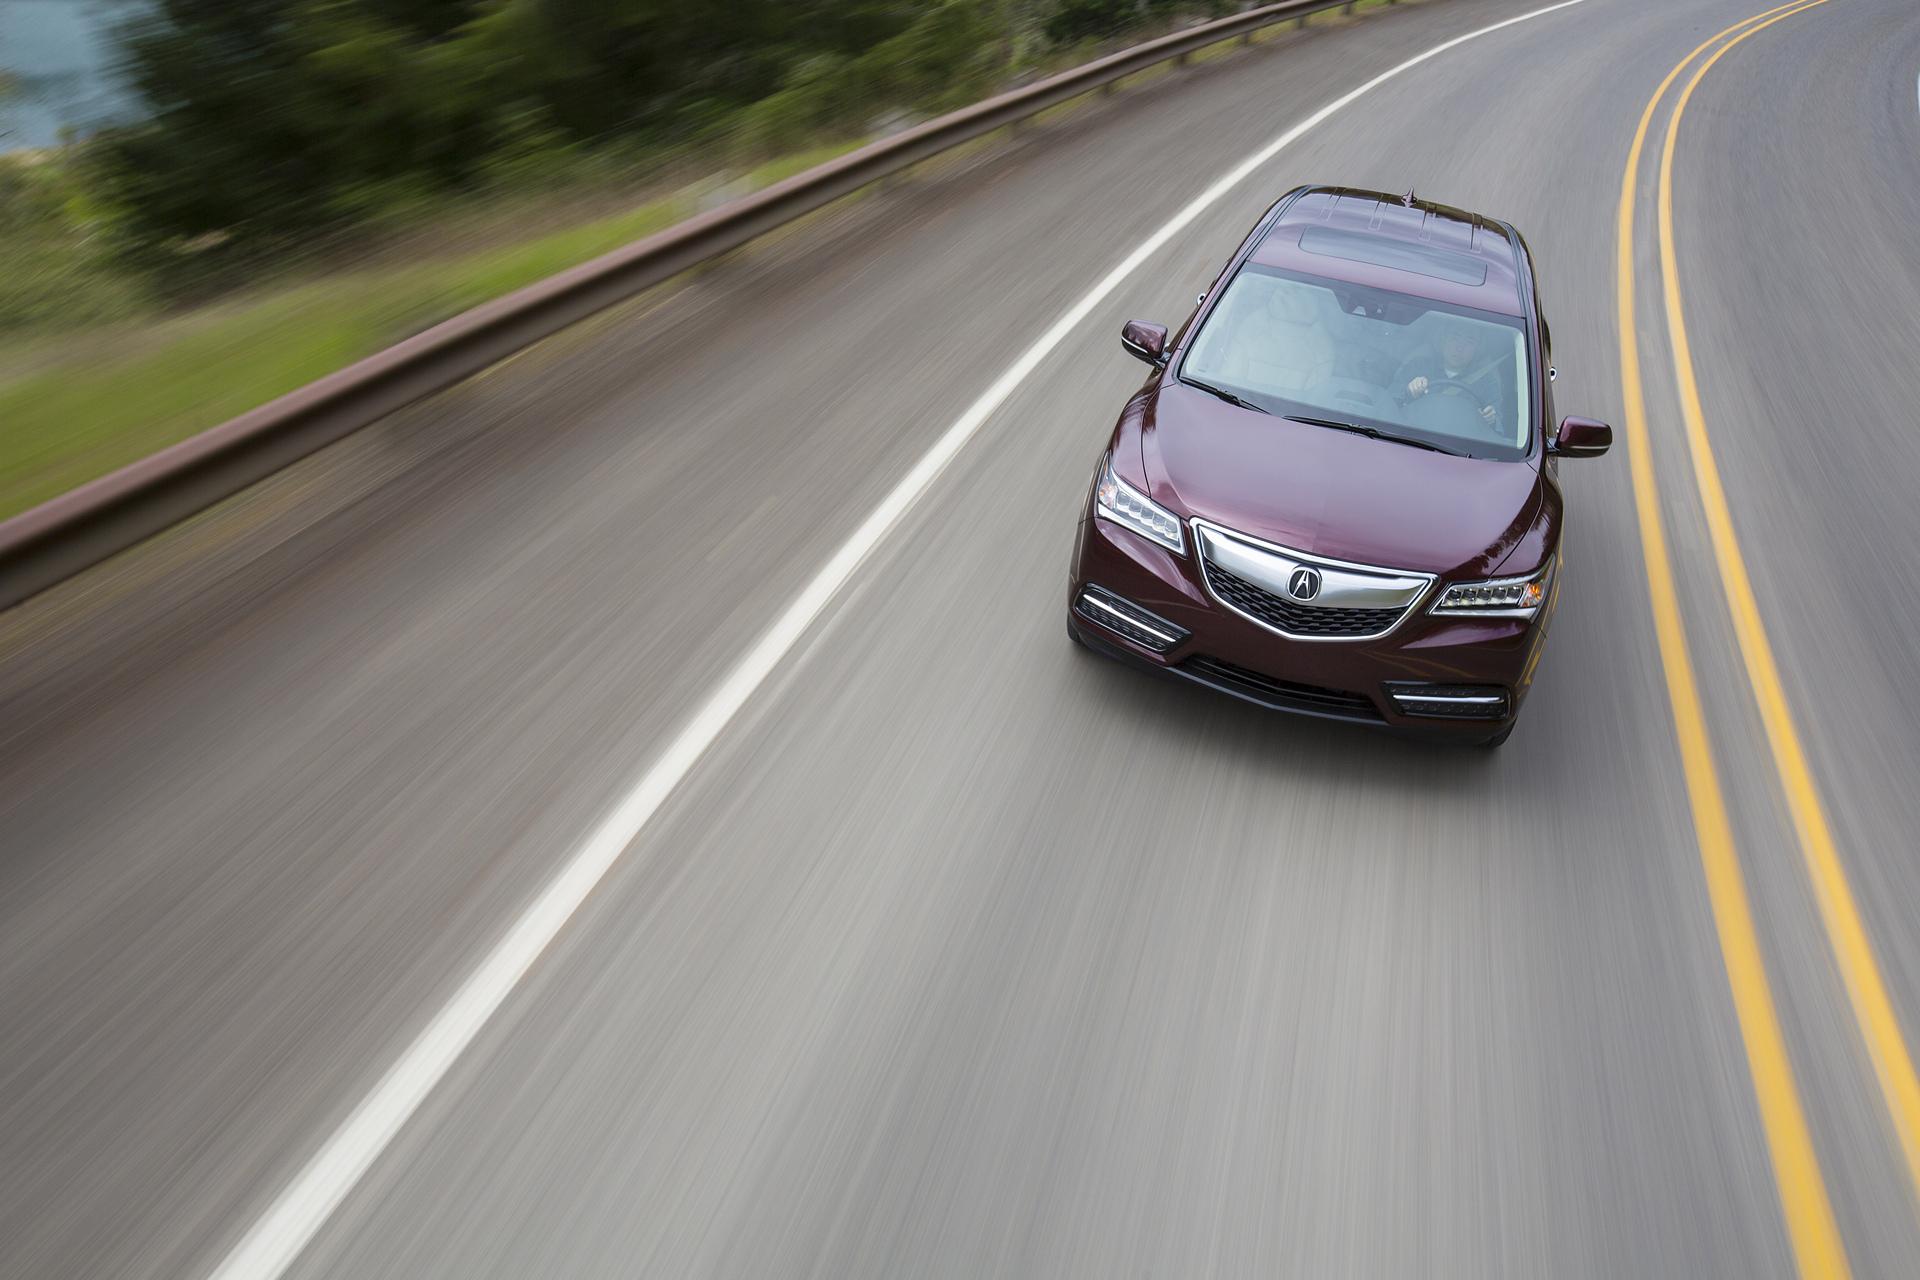 2016 Acura MDX © Honda Motor Co., Ltd.